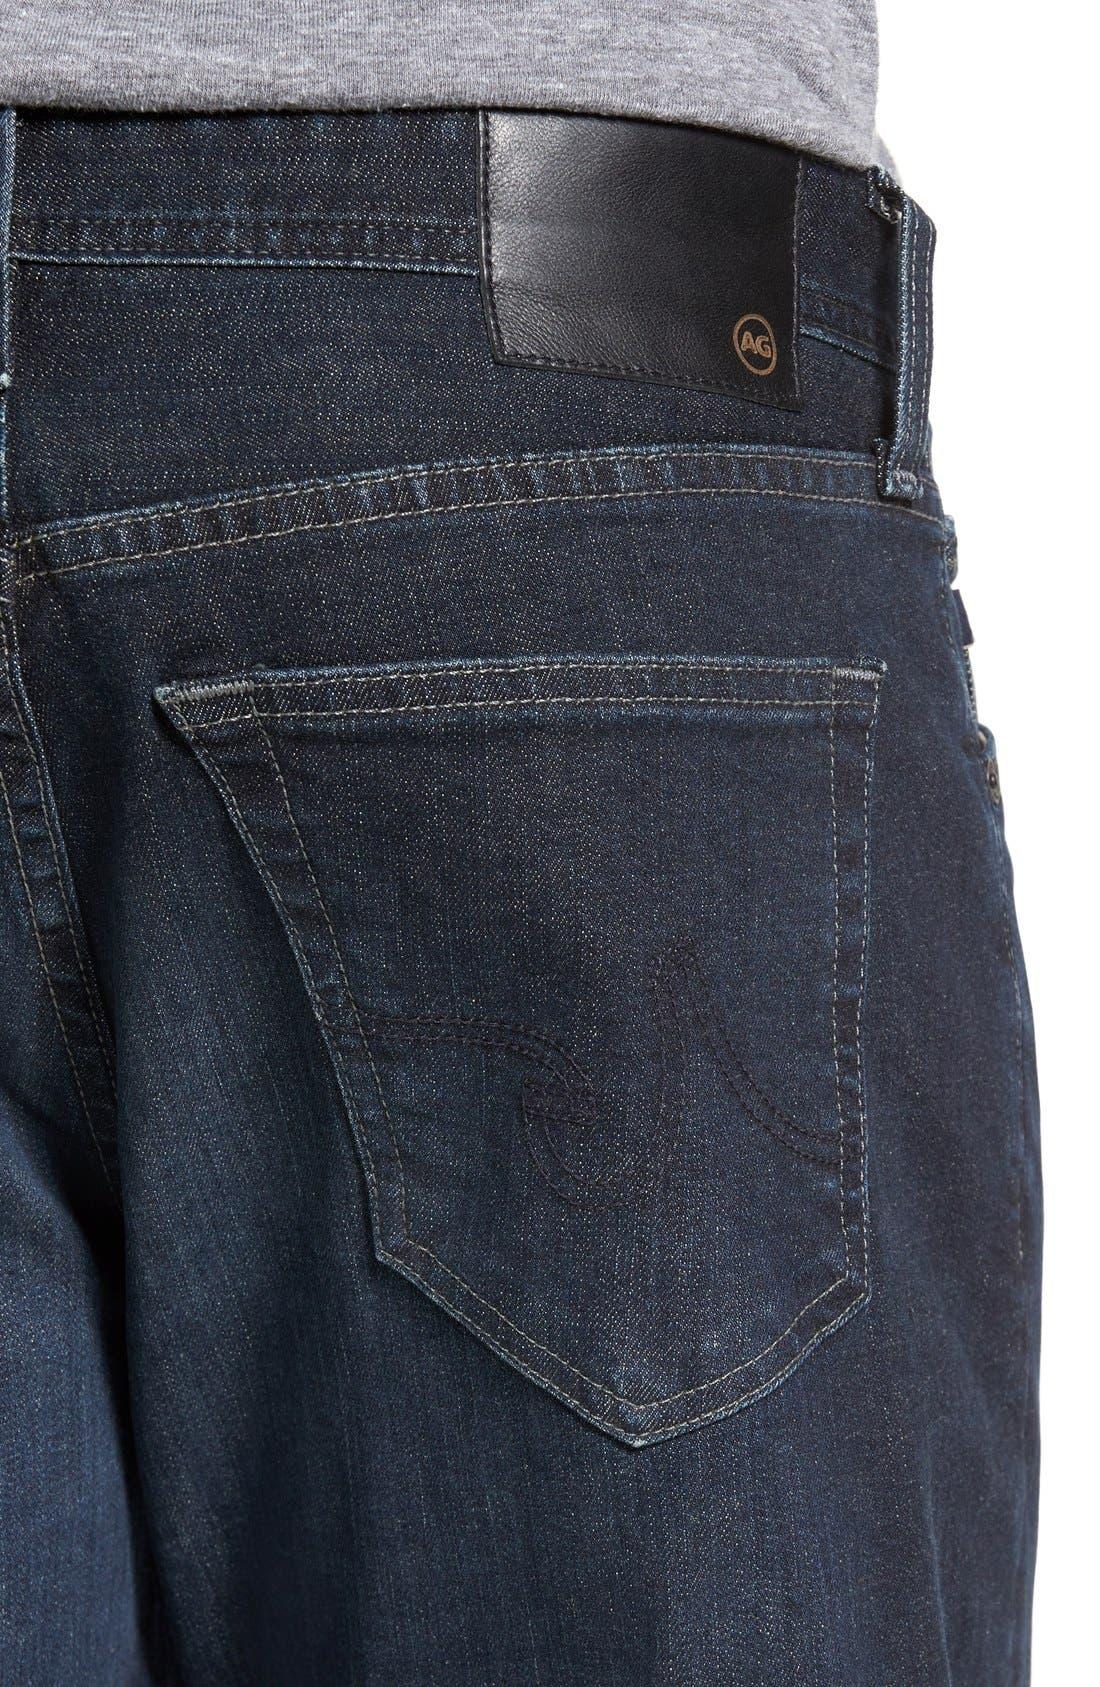 Graduate Slim Straight Leg Jeans,                             Alternate thumbnail 4, color,                             ROCKWELL